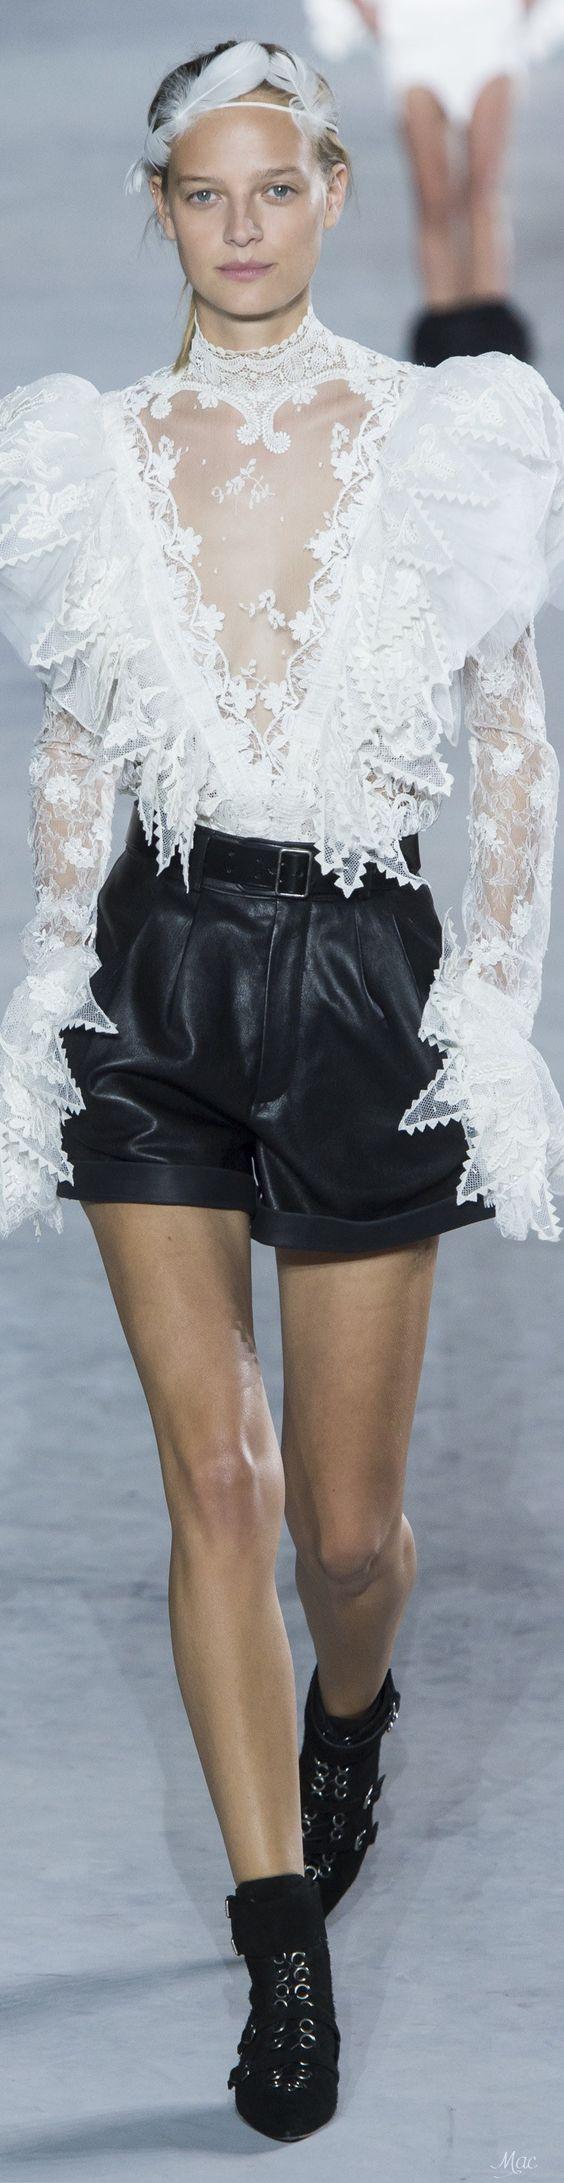 Saint Laurent Summer 2018 Women's Ready to Wear